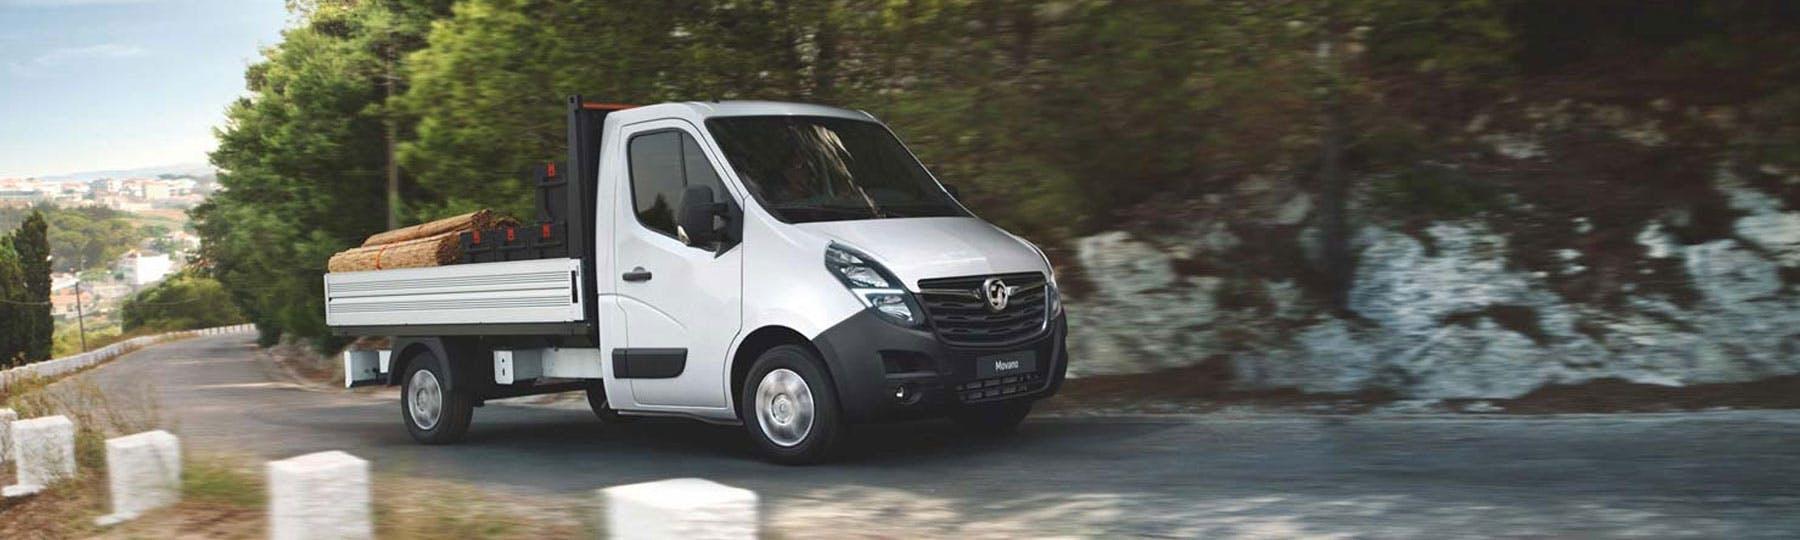 New Vauxhall Movano Conversions